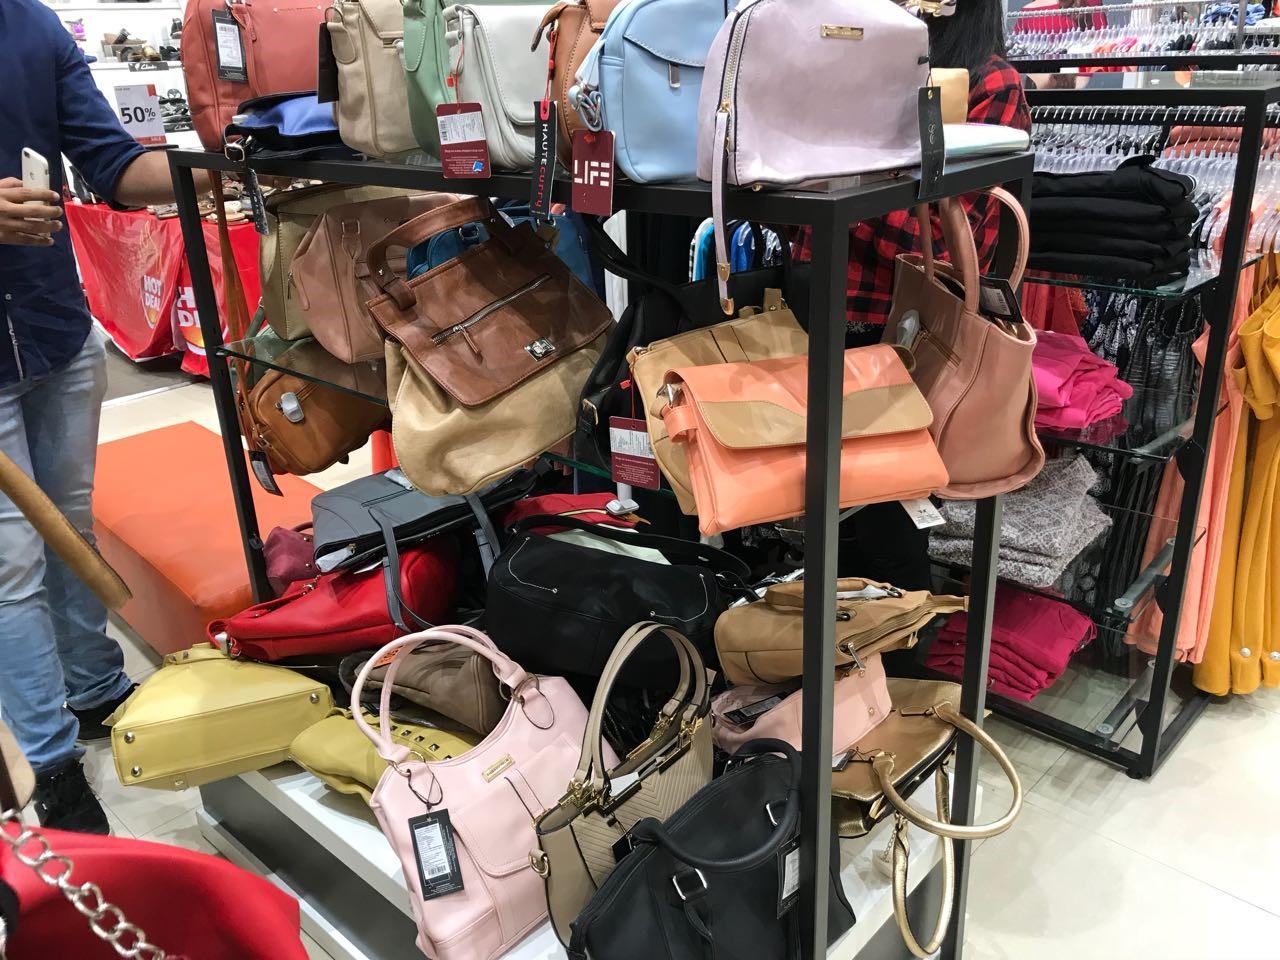 bag section internship journey of a jediiian at shoppers stop - bag section - Internship Journey of a JEDIIIAN at Shoppers Stop